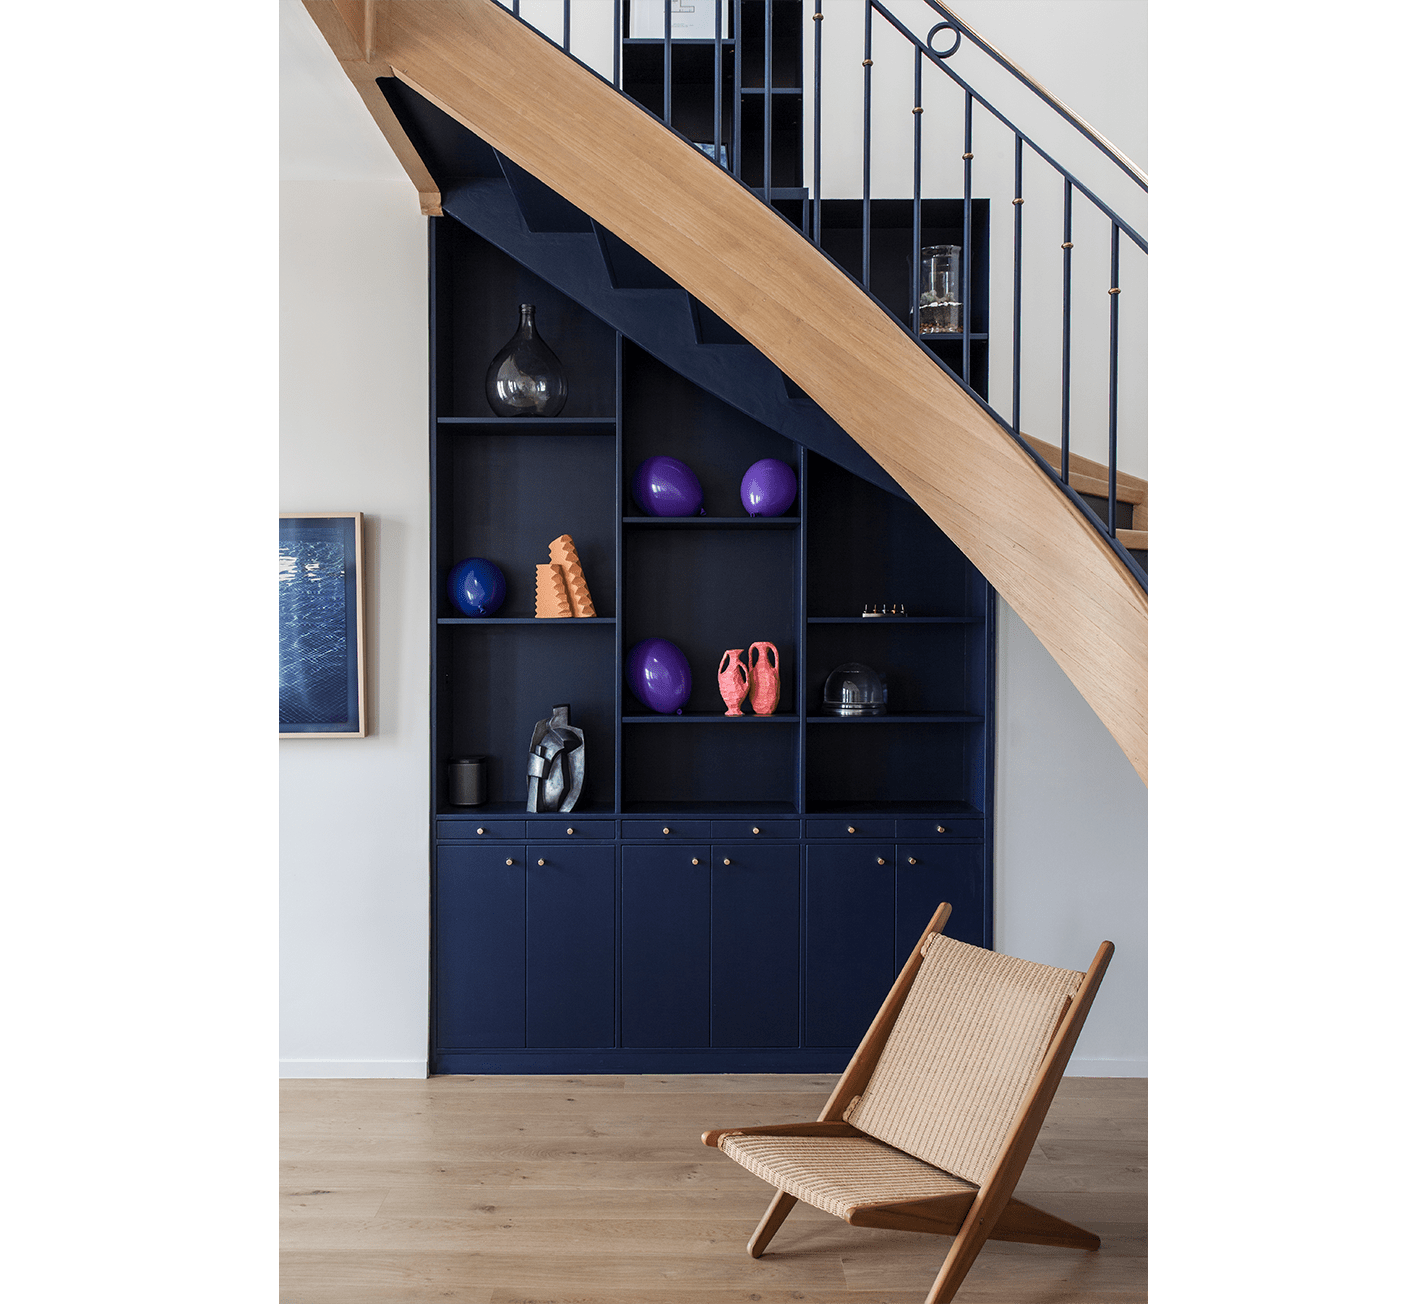 Projet-Arlequin-Atelier-Steve-Pauline-Borgia-Architecture-interieur-17-min